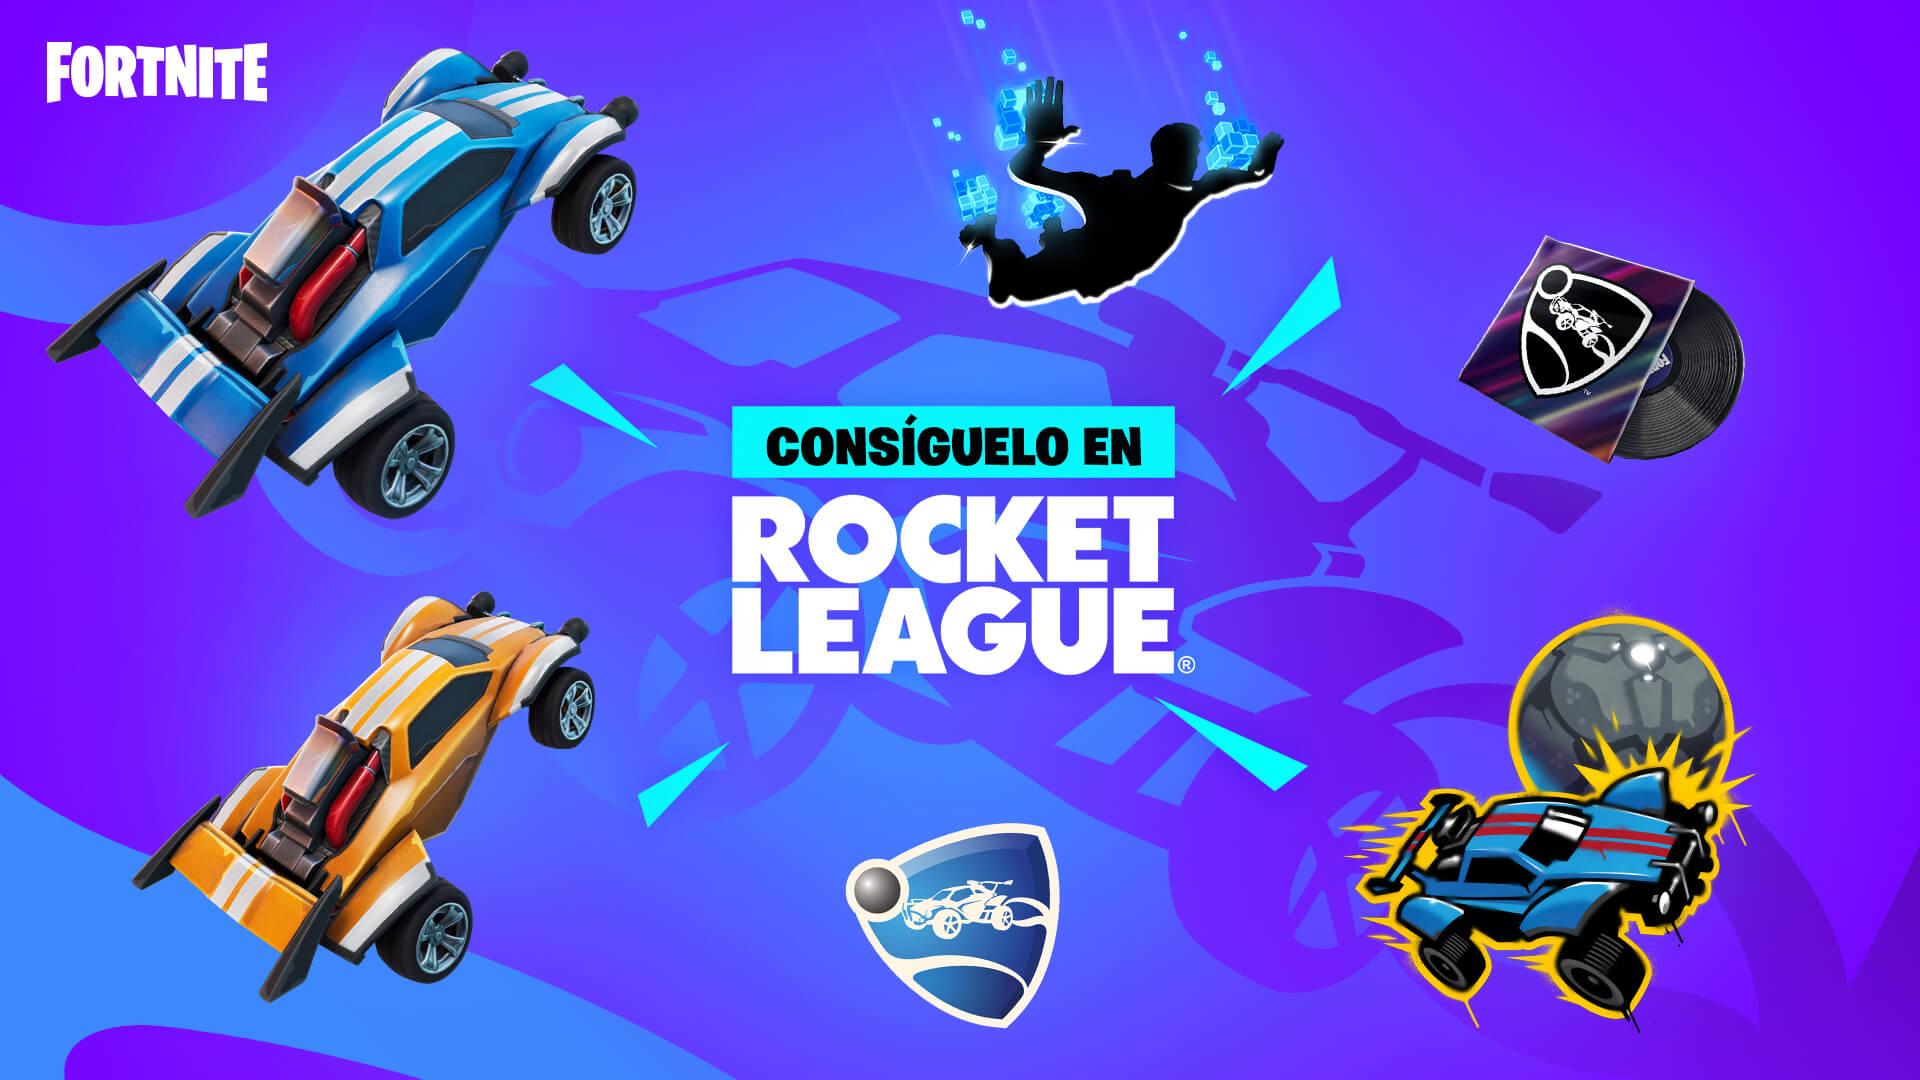 ES ES Rocket League Fortnite Challenges And Rewards